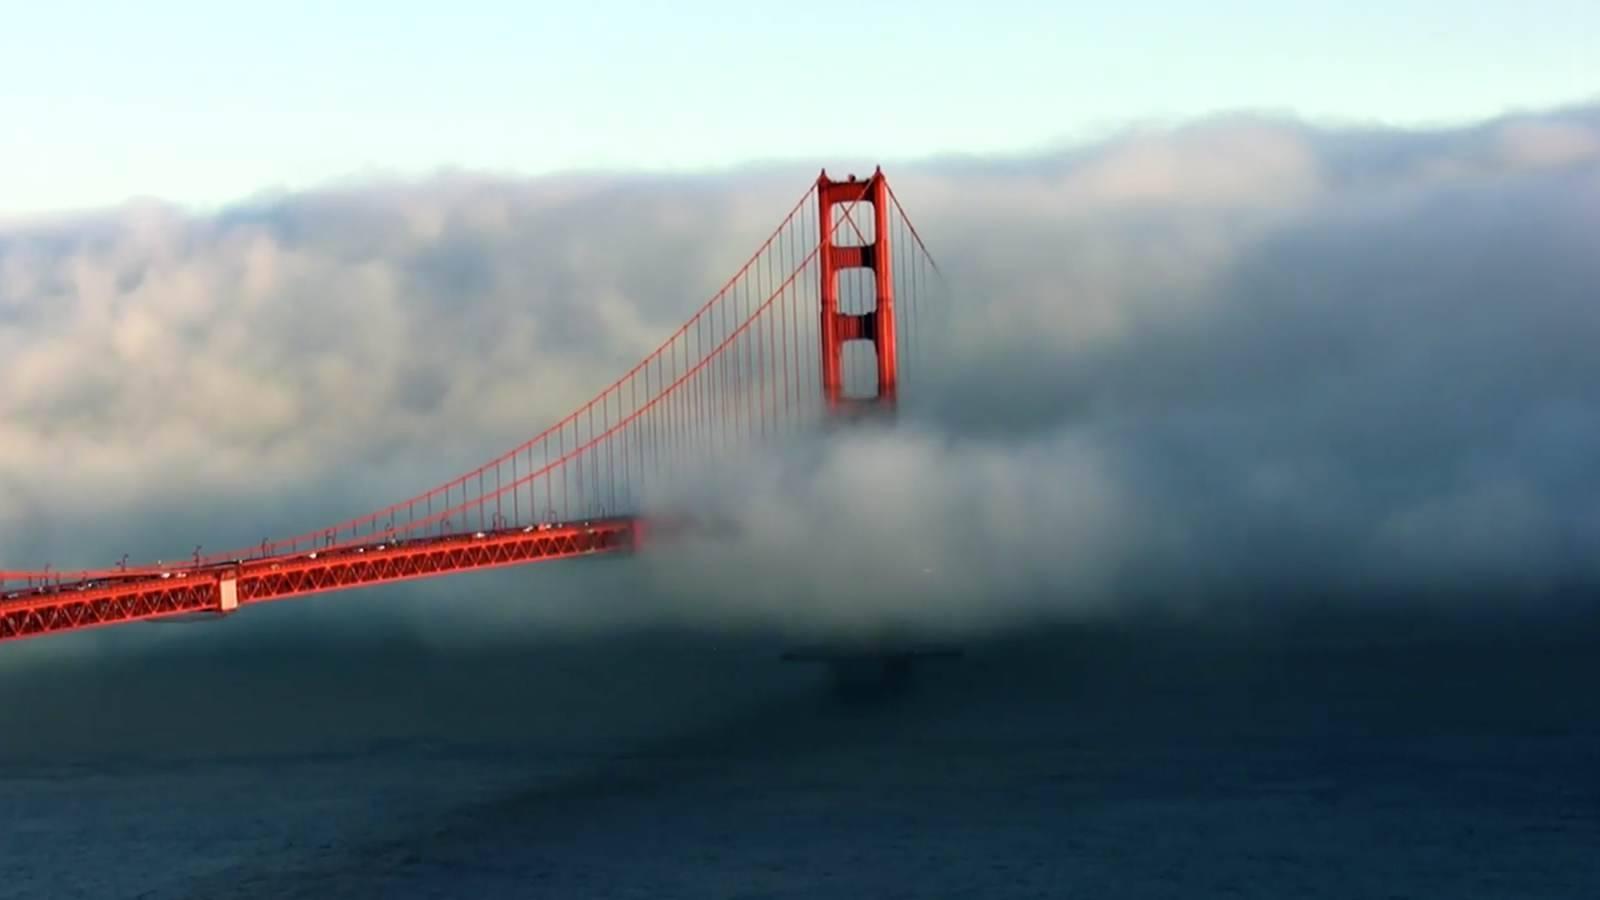 Мост «золотые ворота» — символ сан-франциско